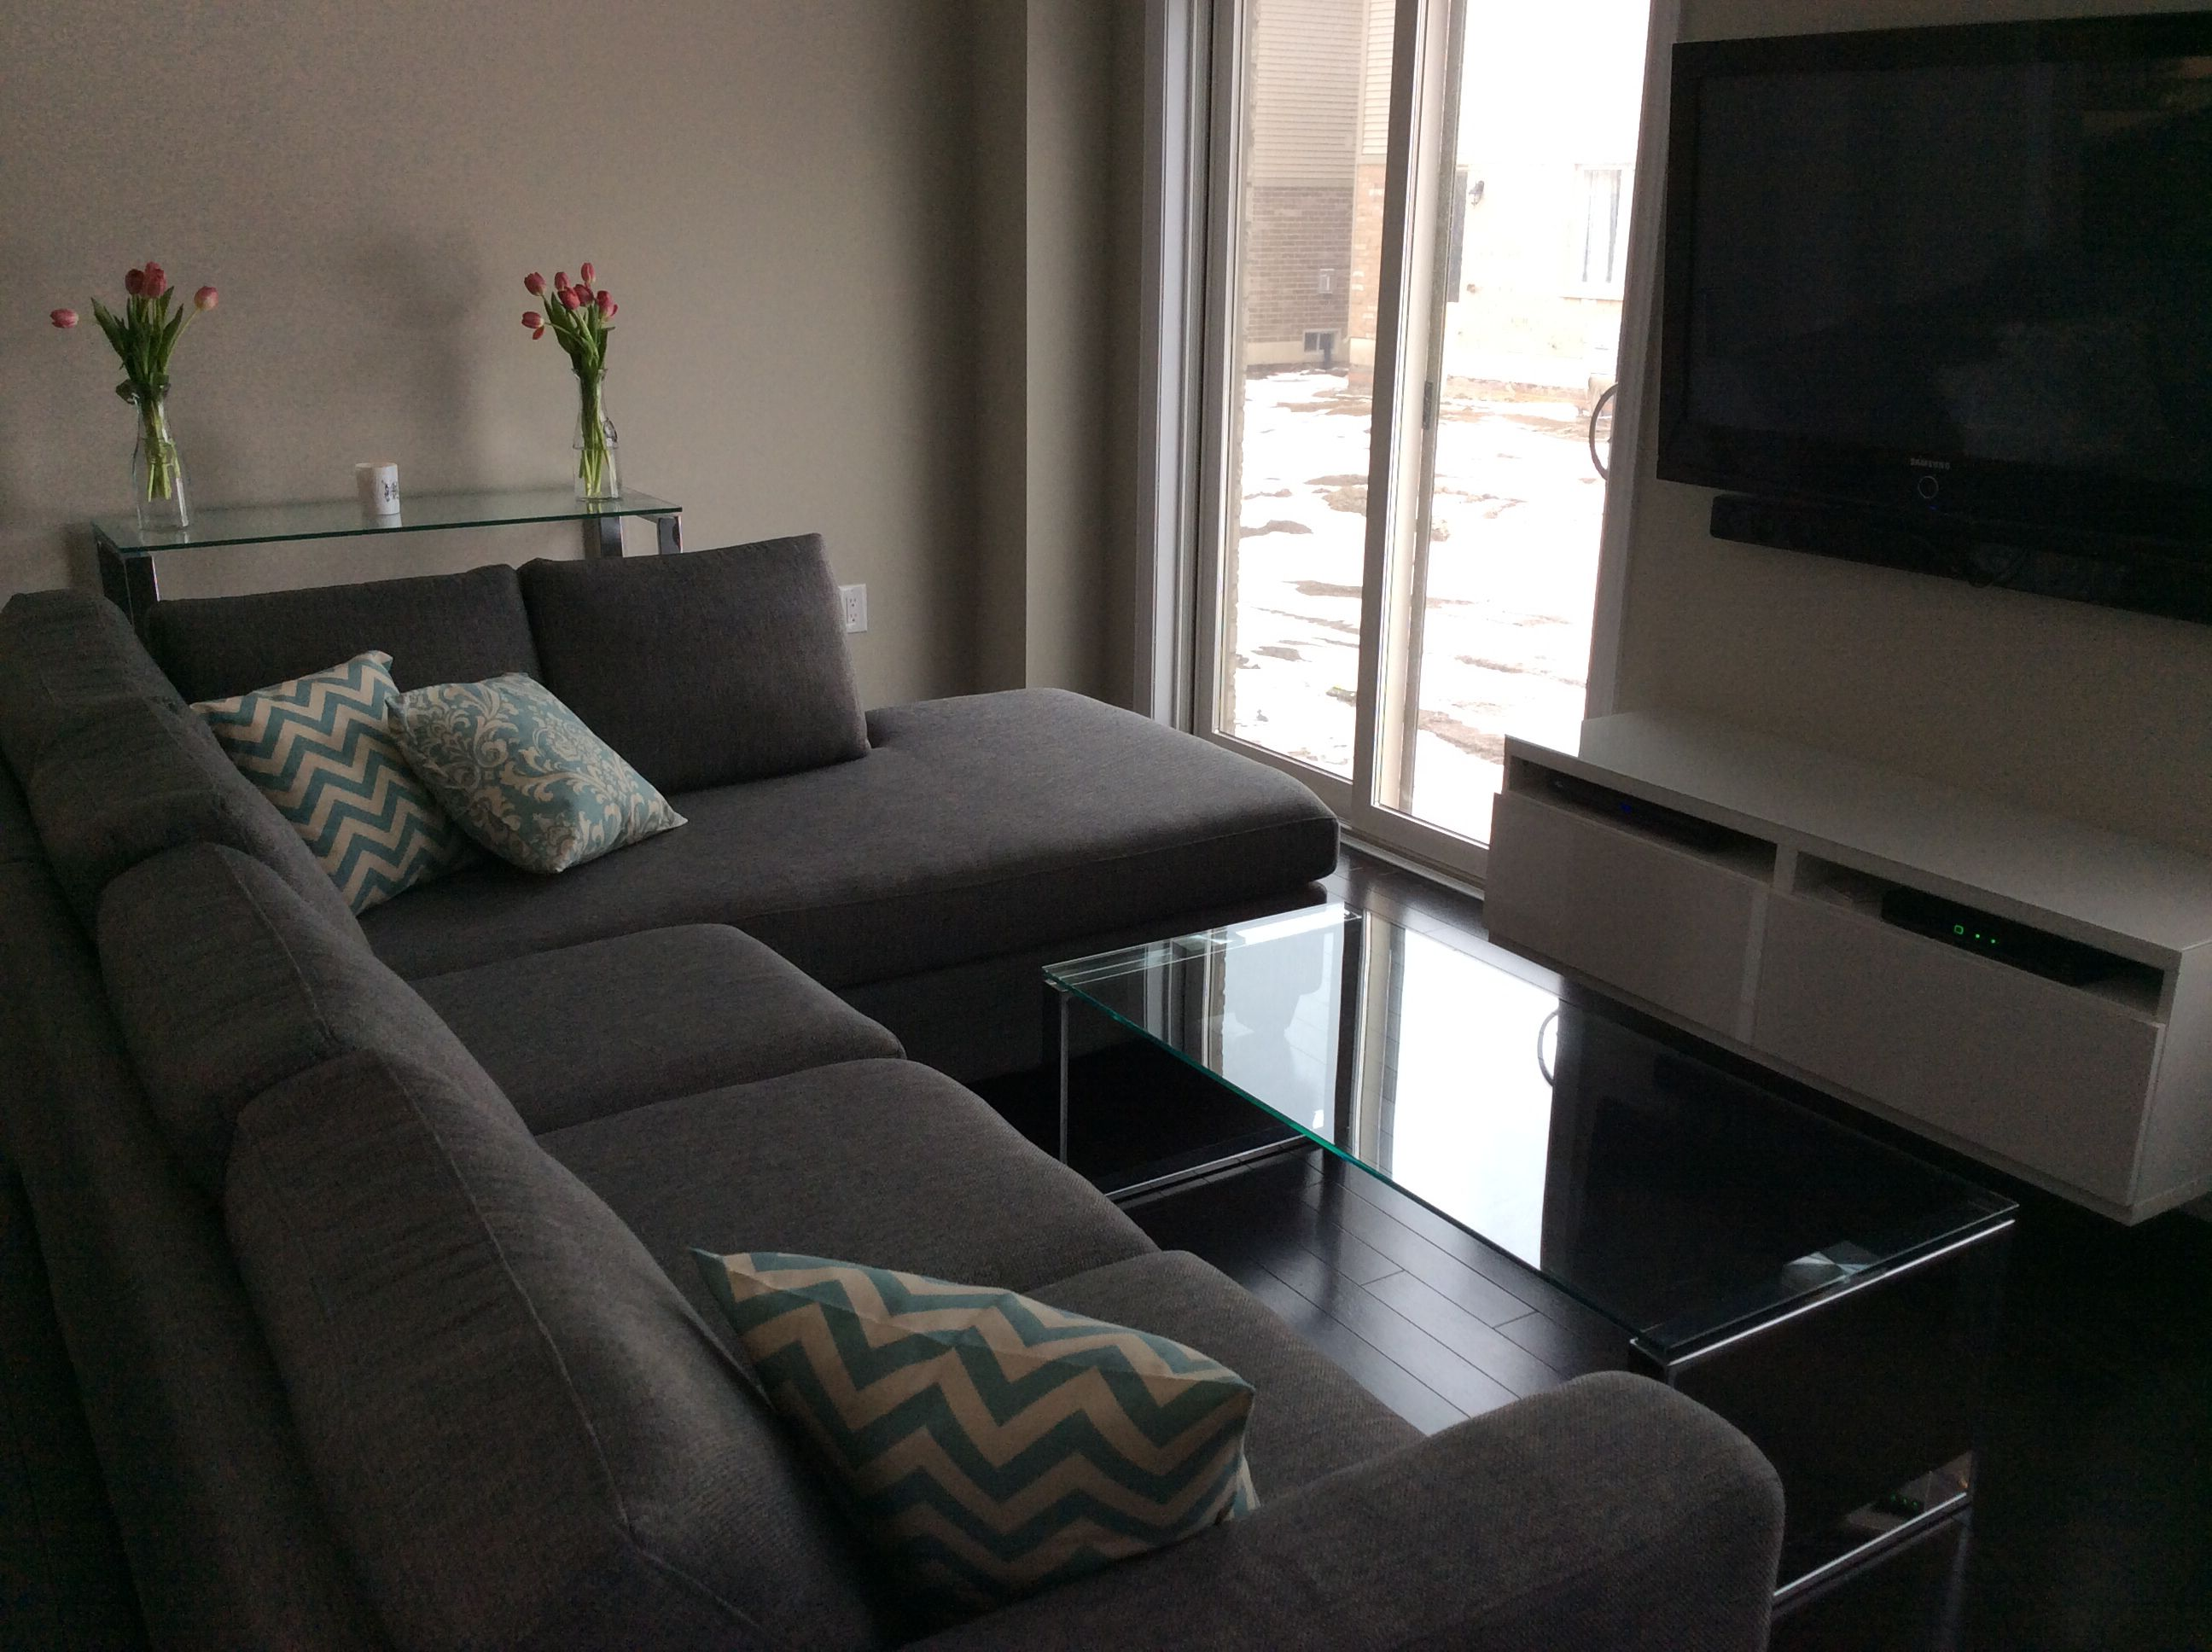 Durango sofa and Katrine coffee table urban barn living room